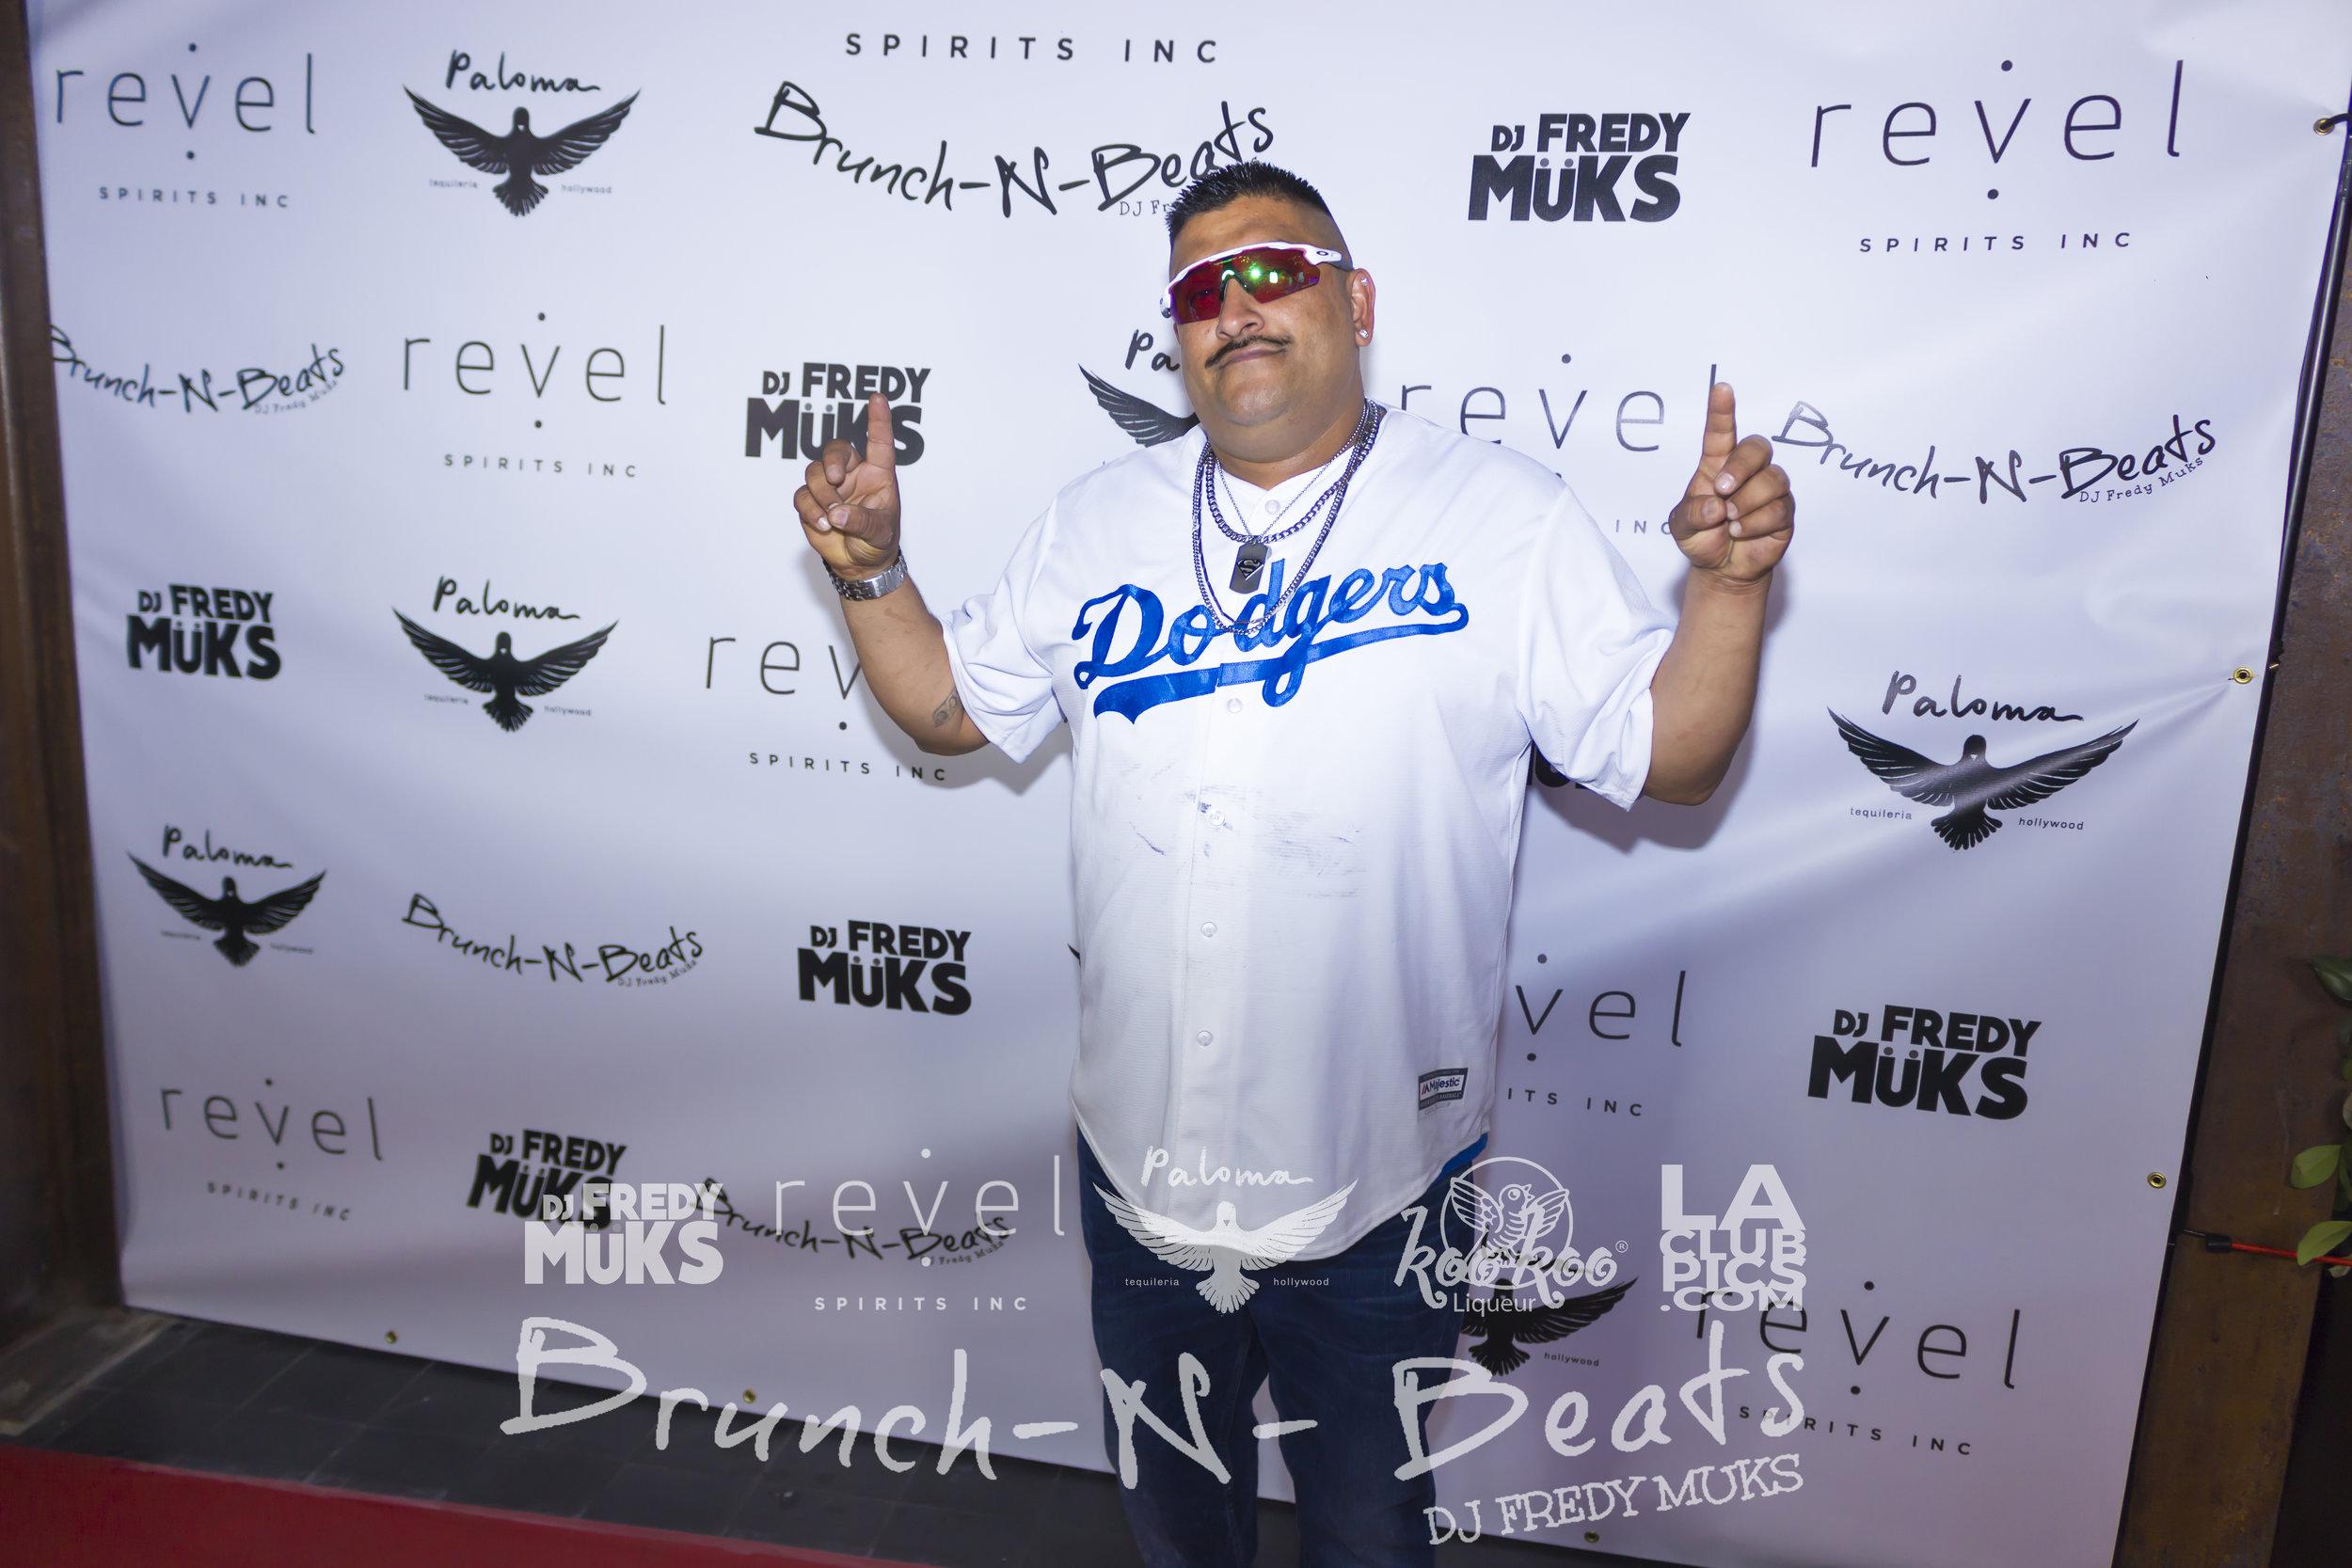 Brunch-N-Beats - Paloma Hollywood - 02-25-18_166.jpg